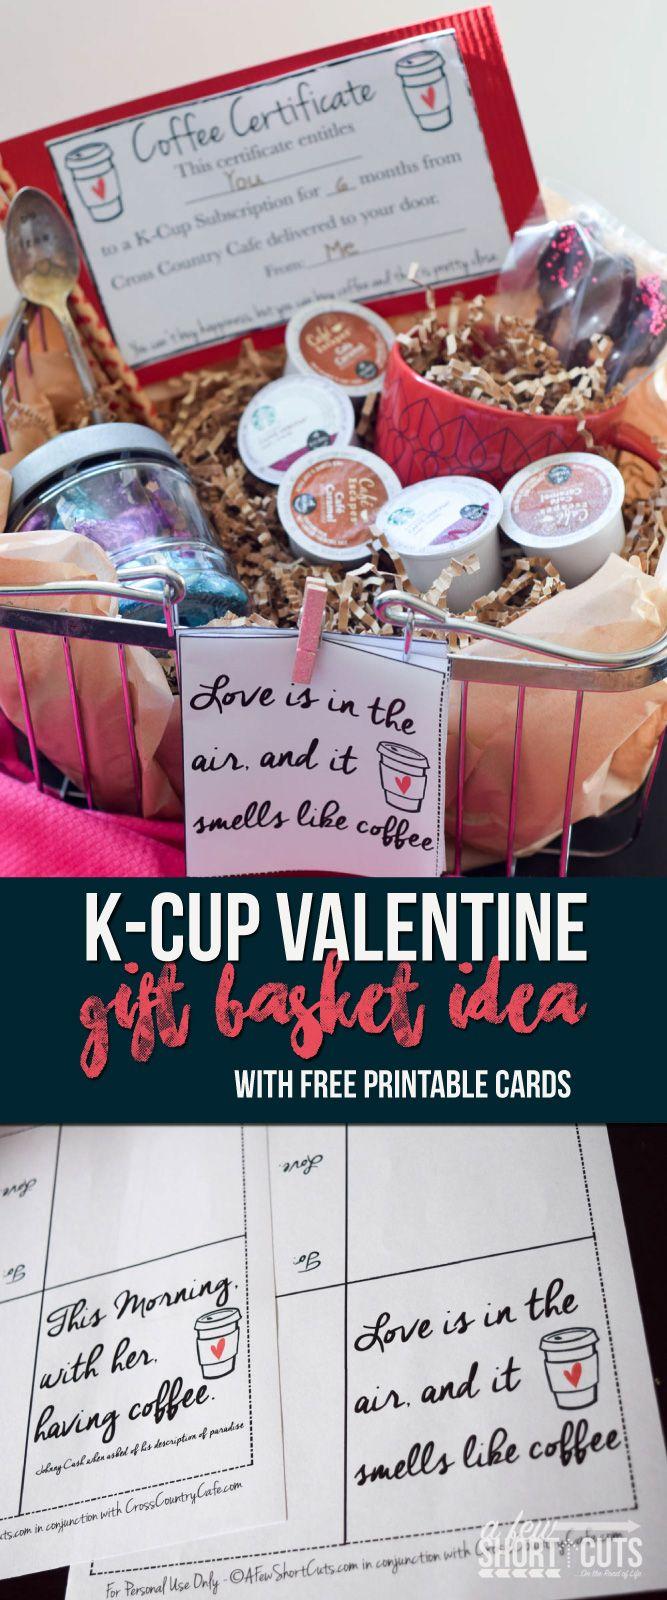 K-Cup Valentine Gift Basket Idea & a K-Cup Giveaway